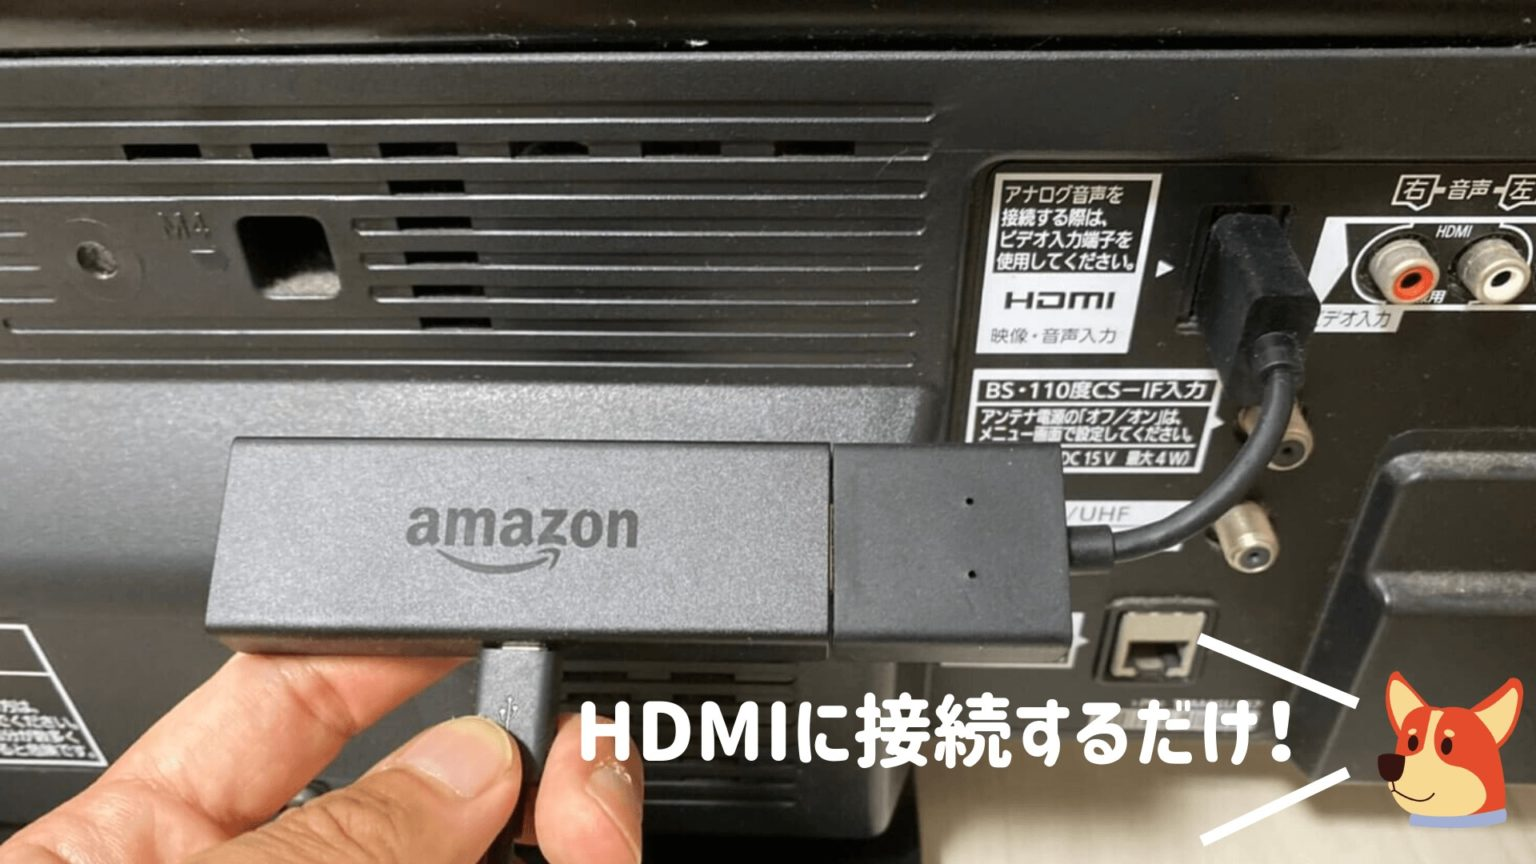 Fire TV StickをHDMI端子に接続している写真